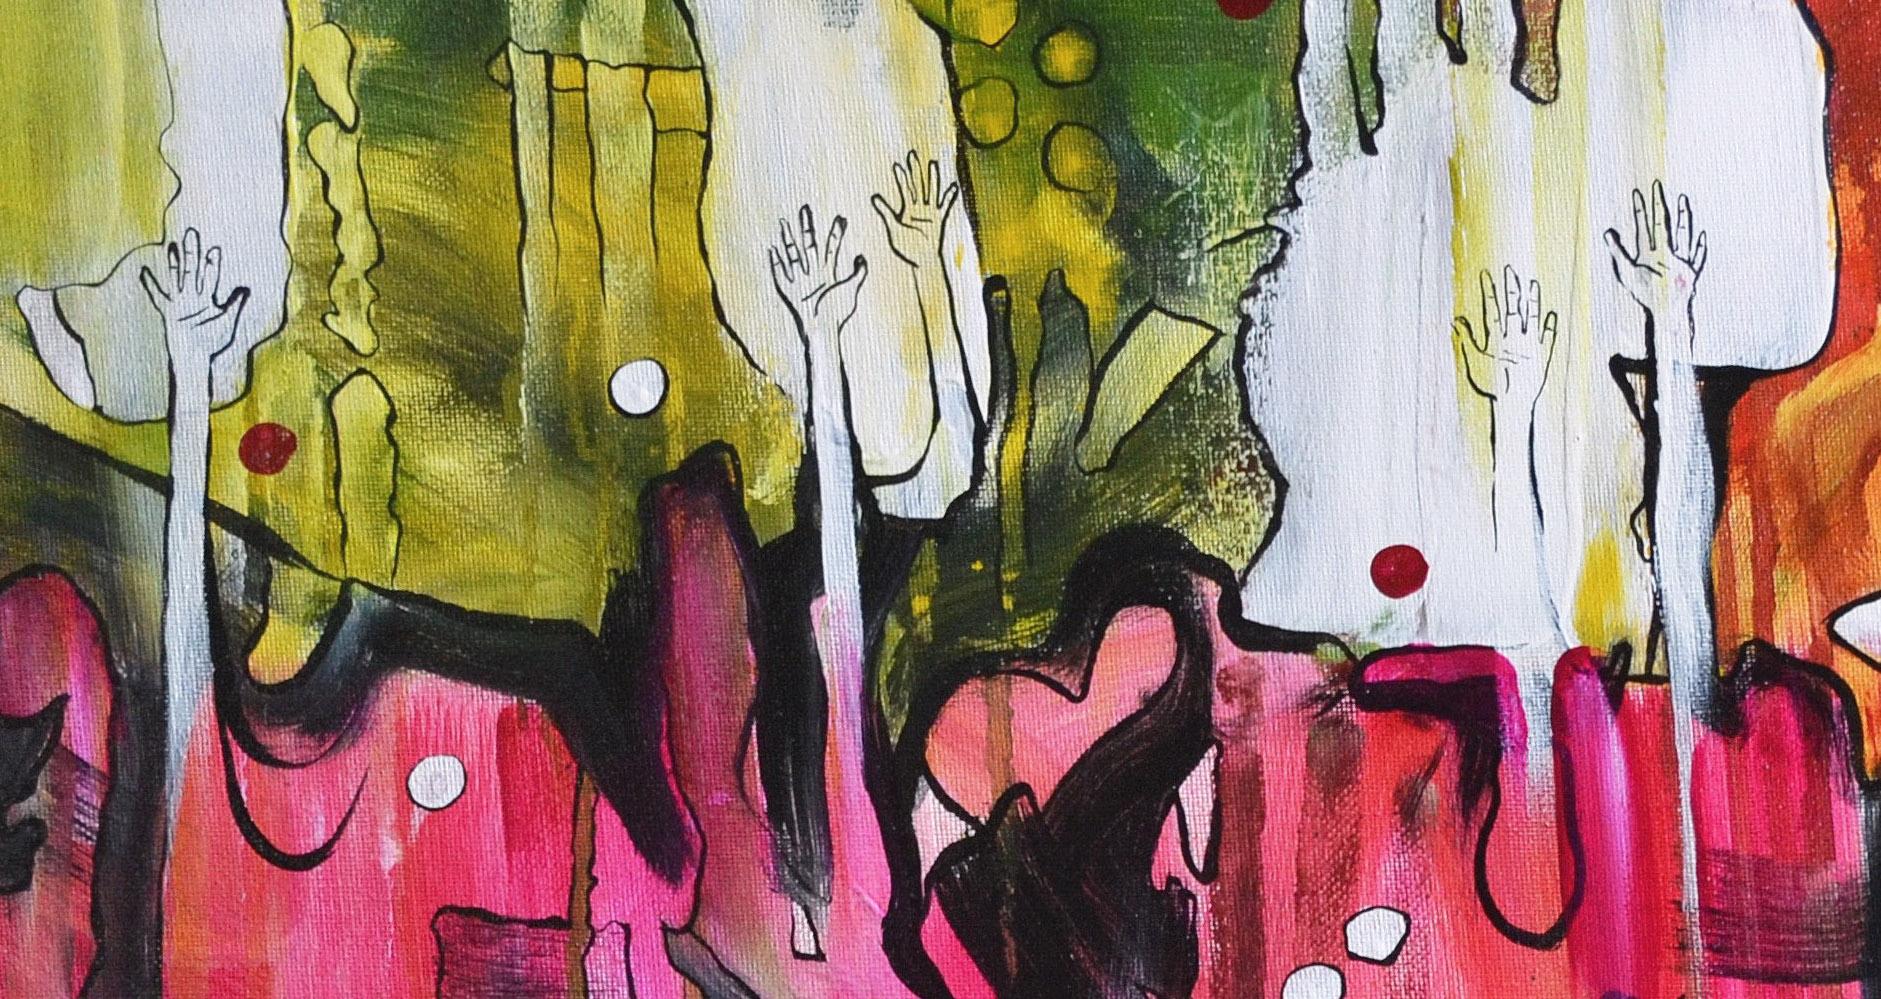 Art by Sarah Greenman